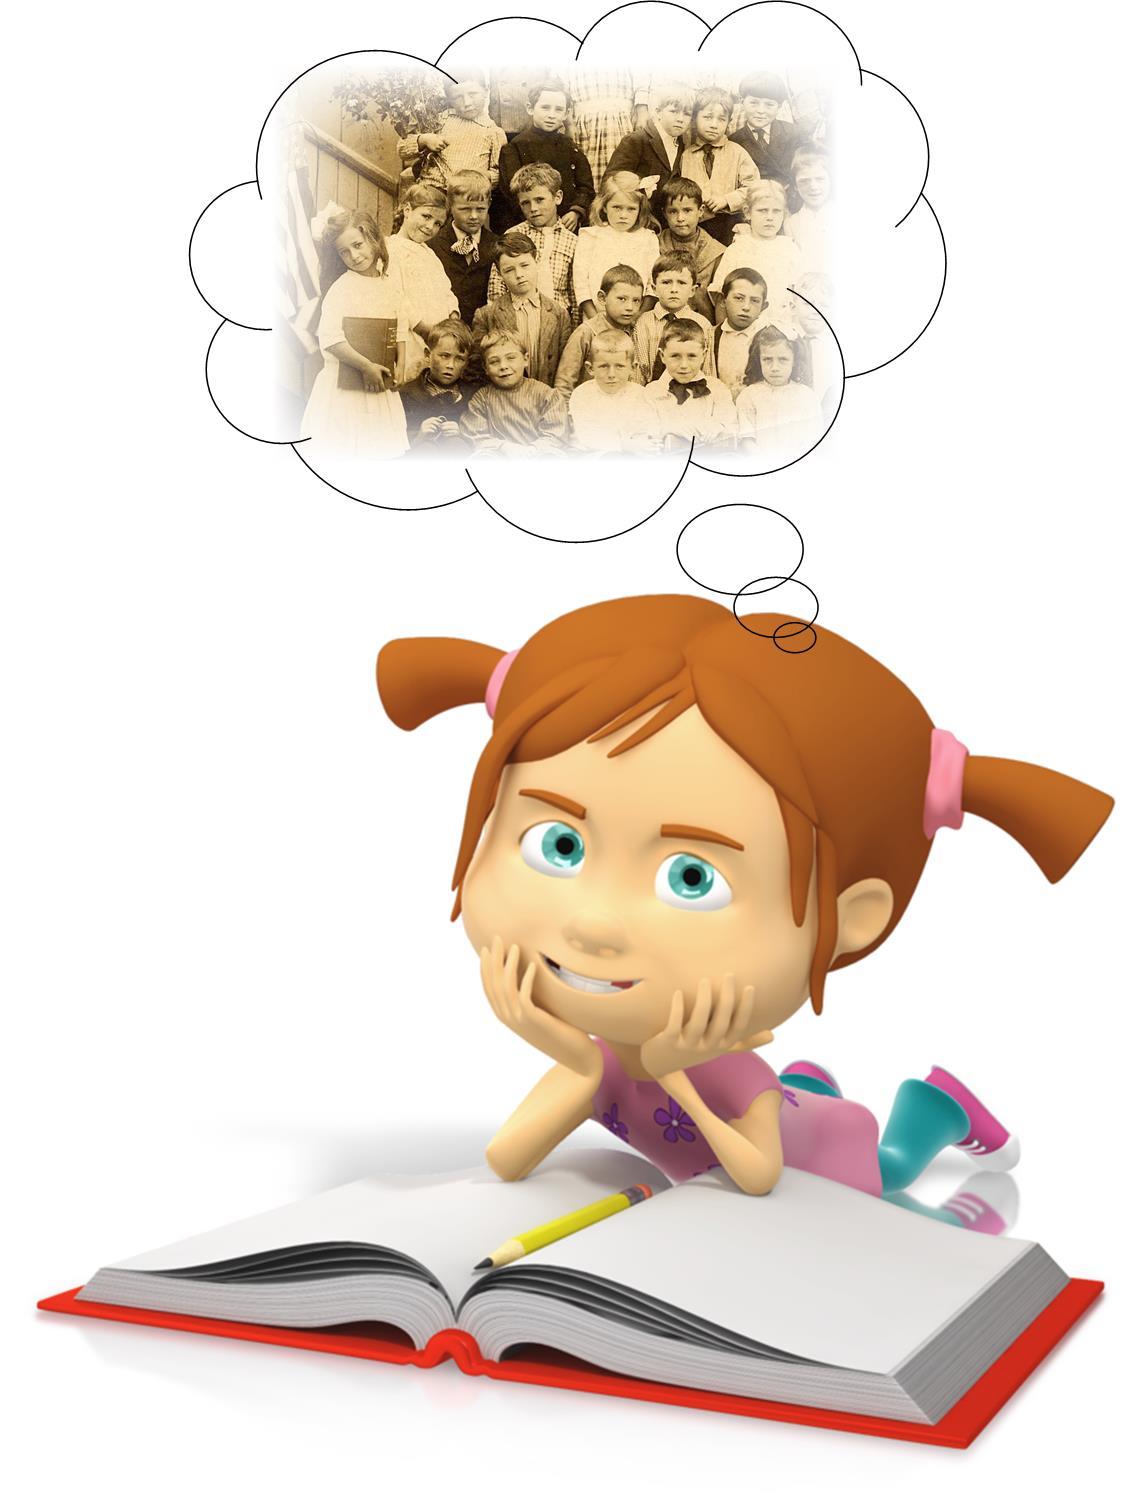 School genealogy records